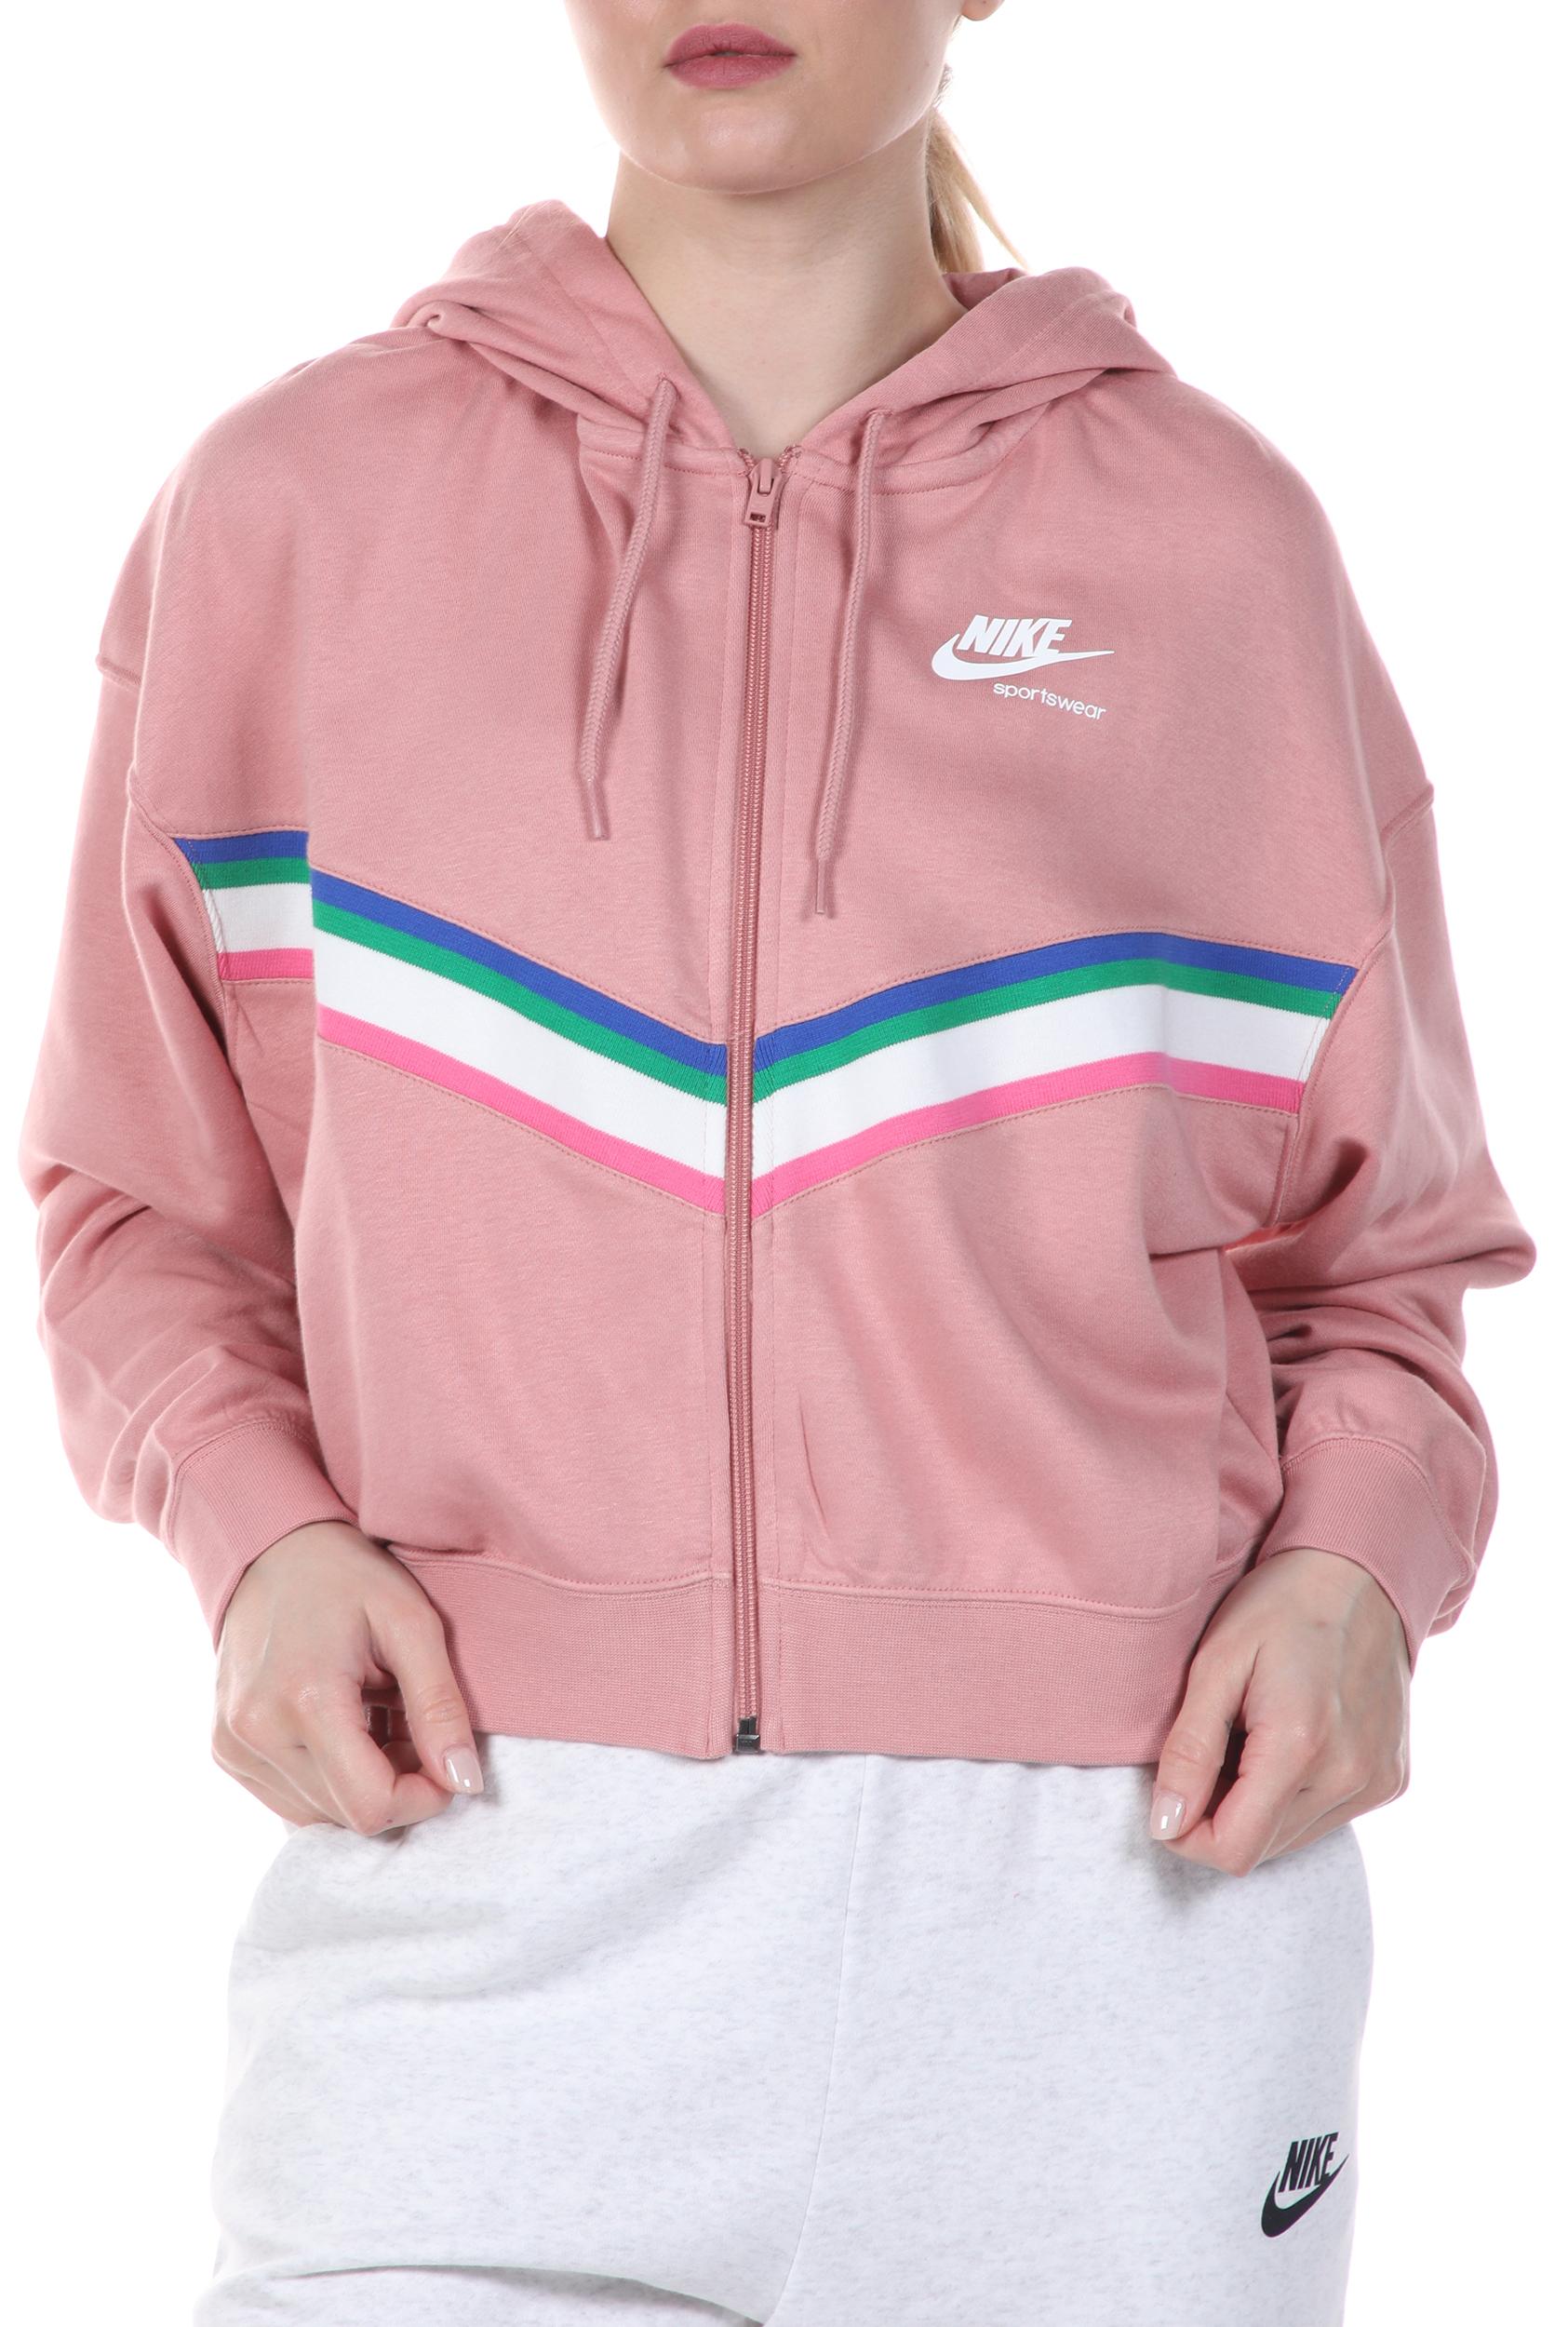 NIKE - Γυναικεία cropped φούτερ ζακέτα NIKE NSW HRTG FZ FLC ροζ